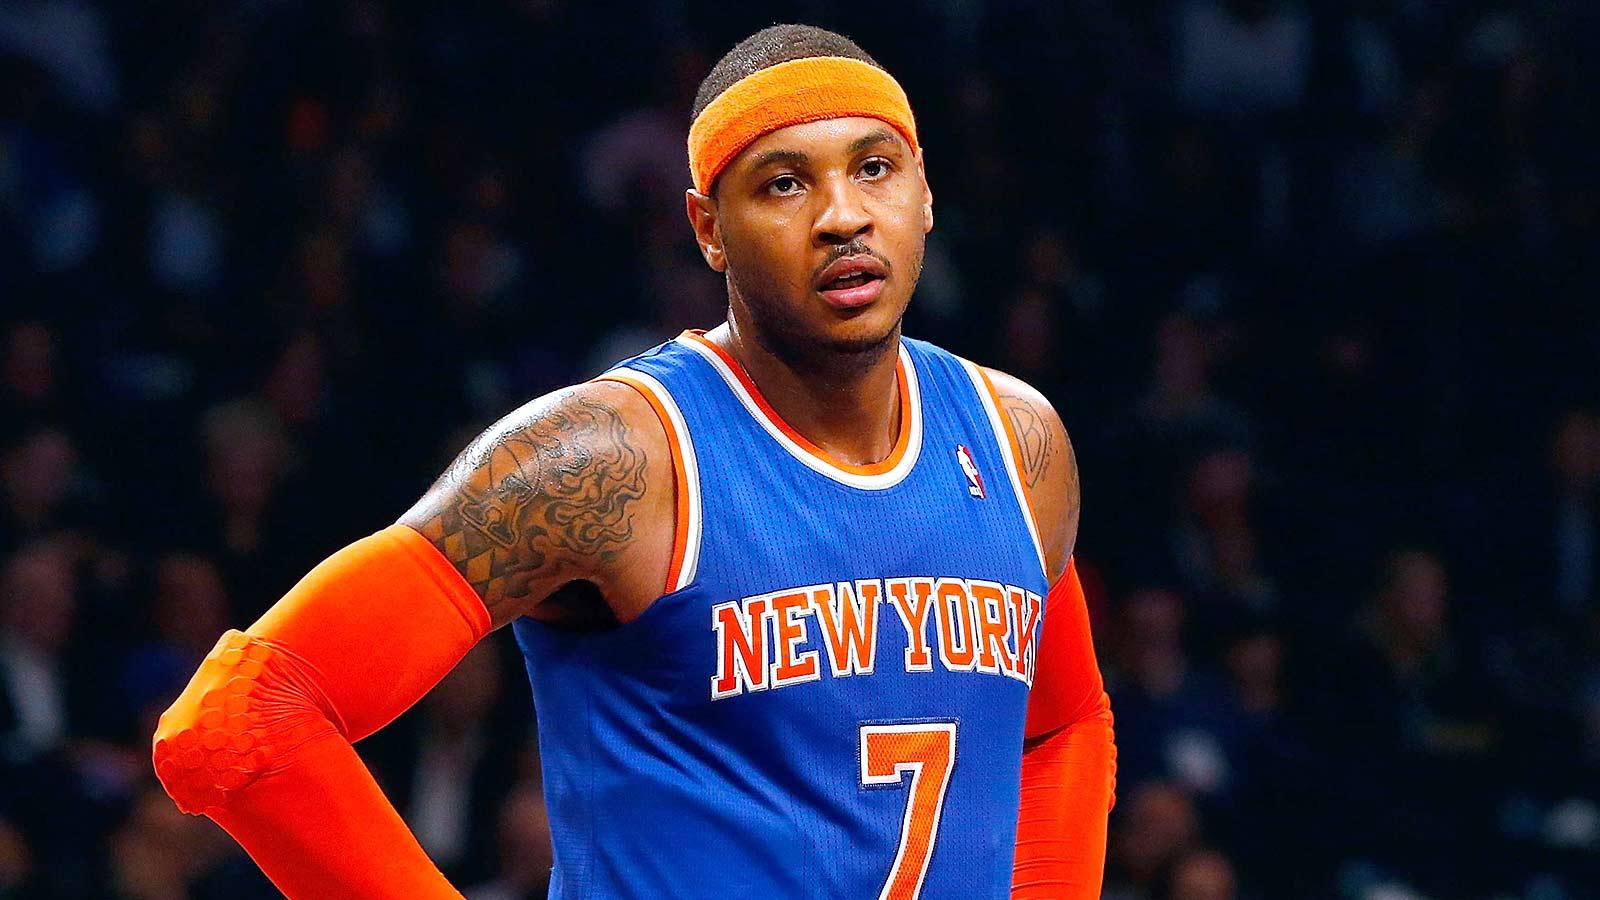 mike woodson New York Knicks Memes